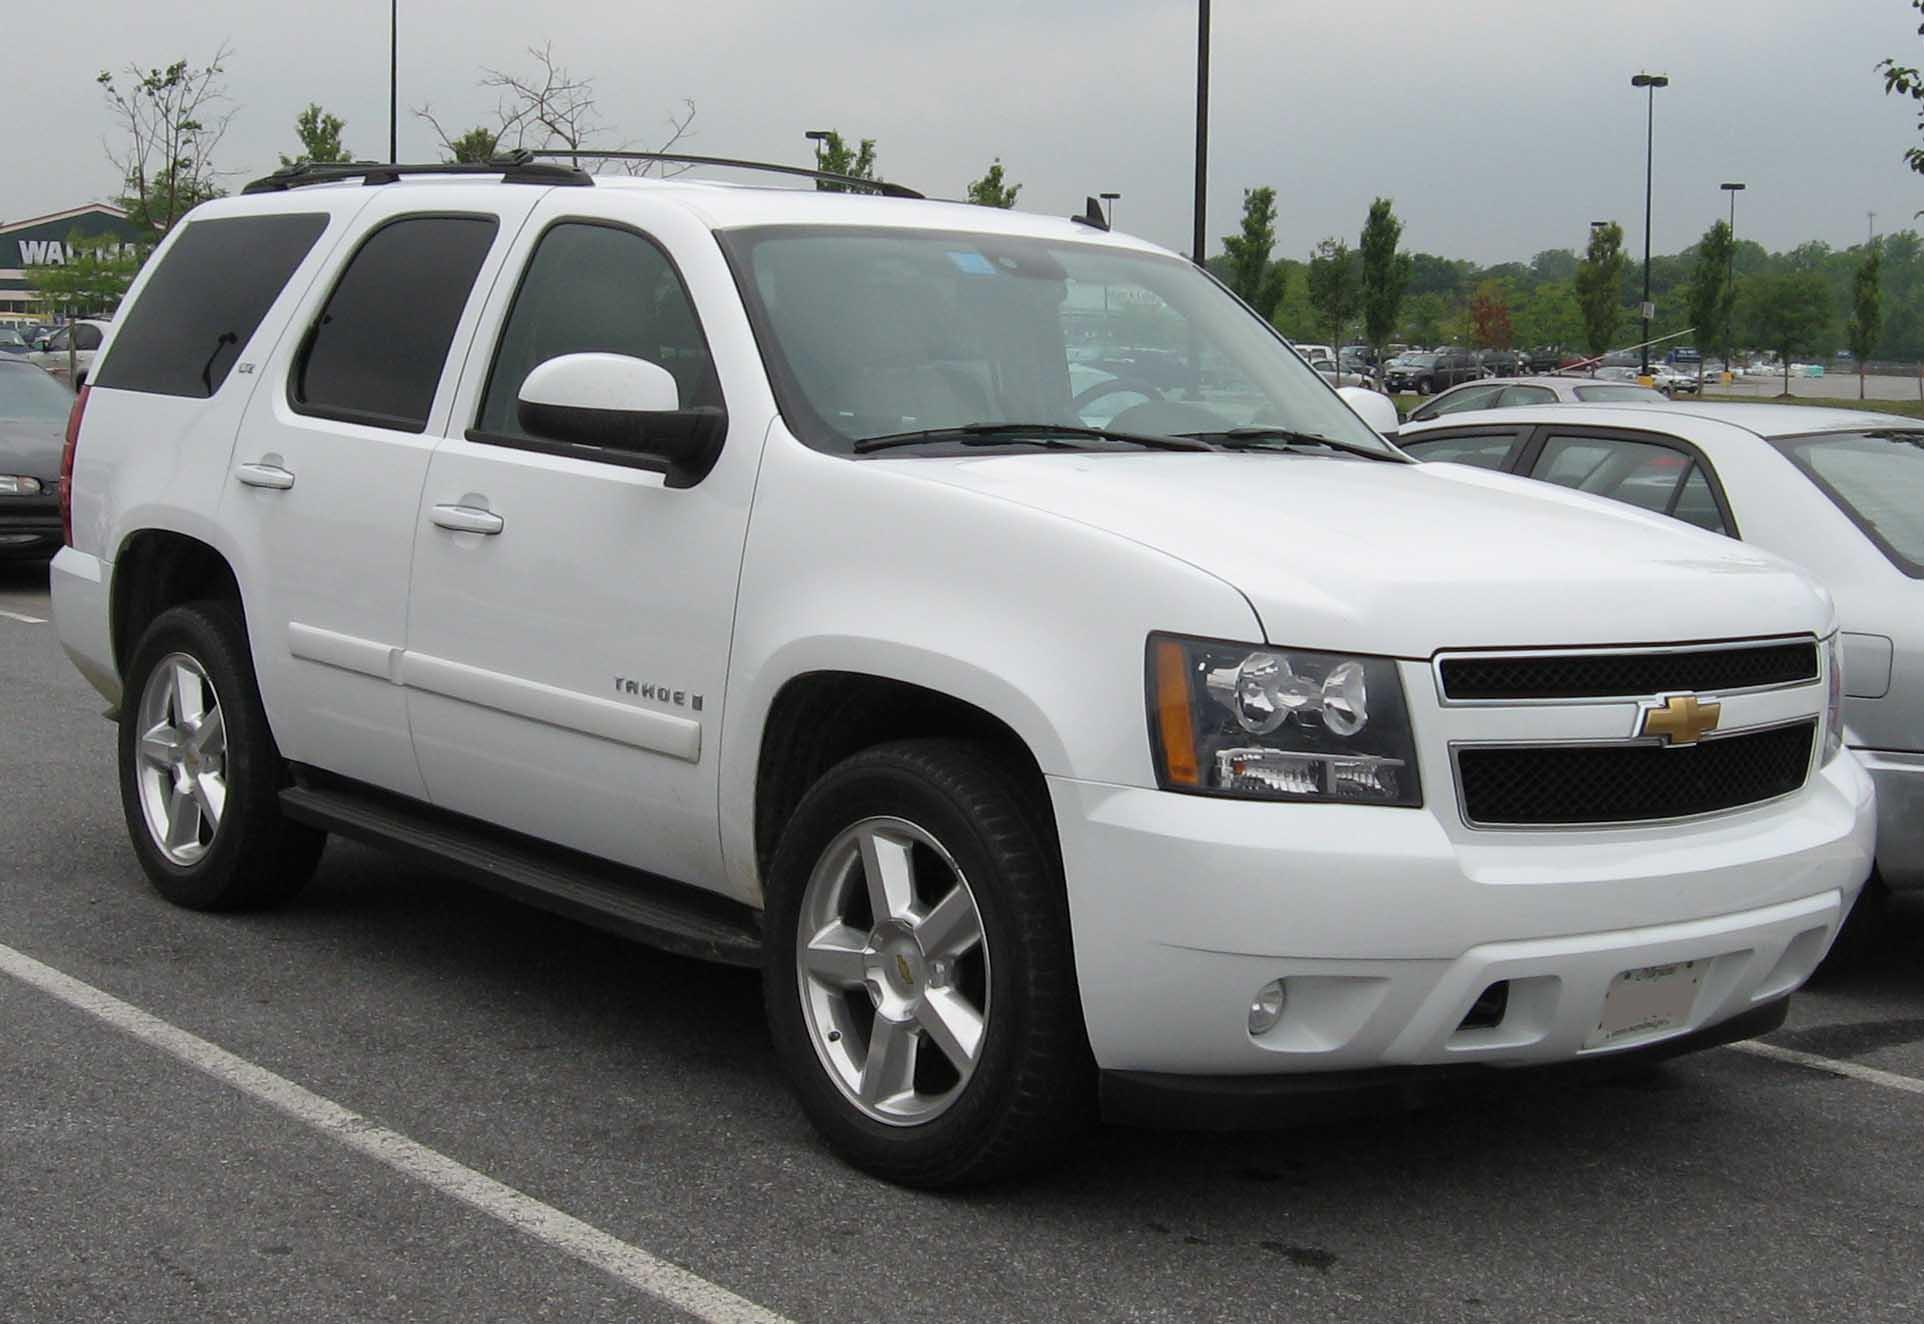 Chevrolet Suburban 2003 foto - 4